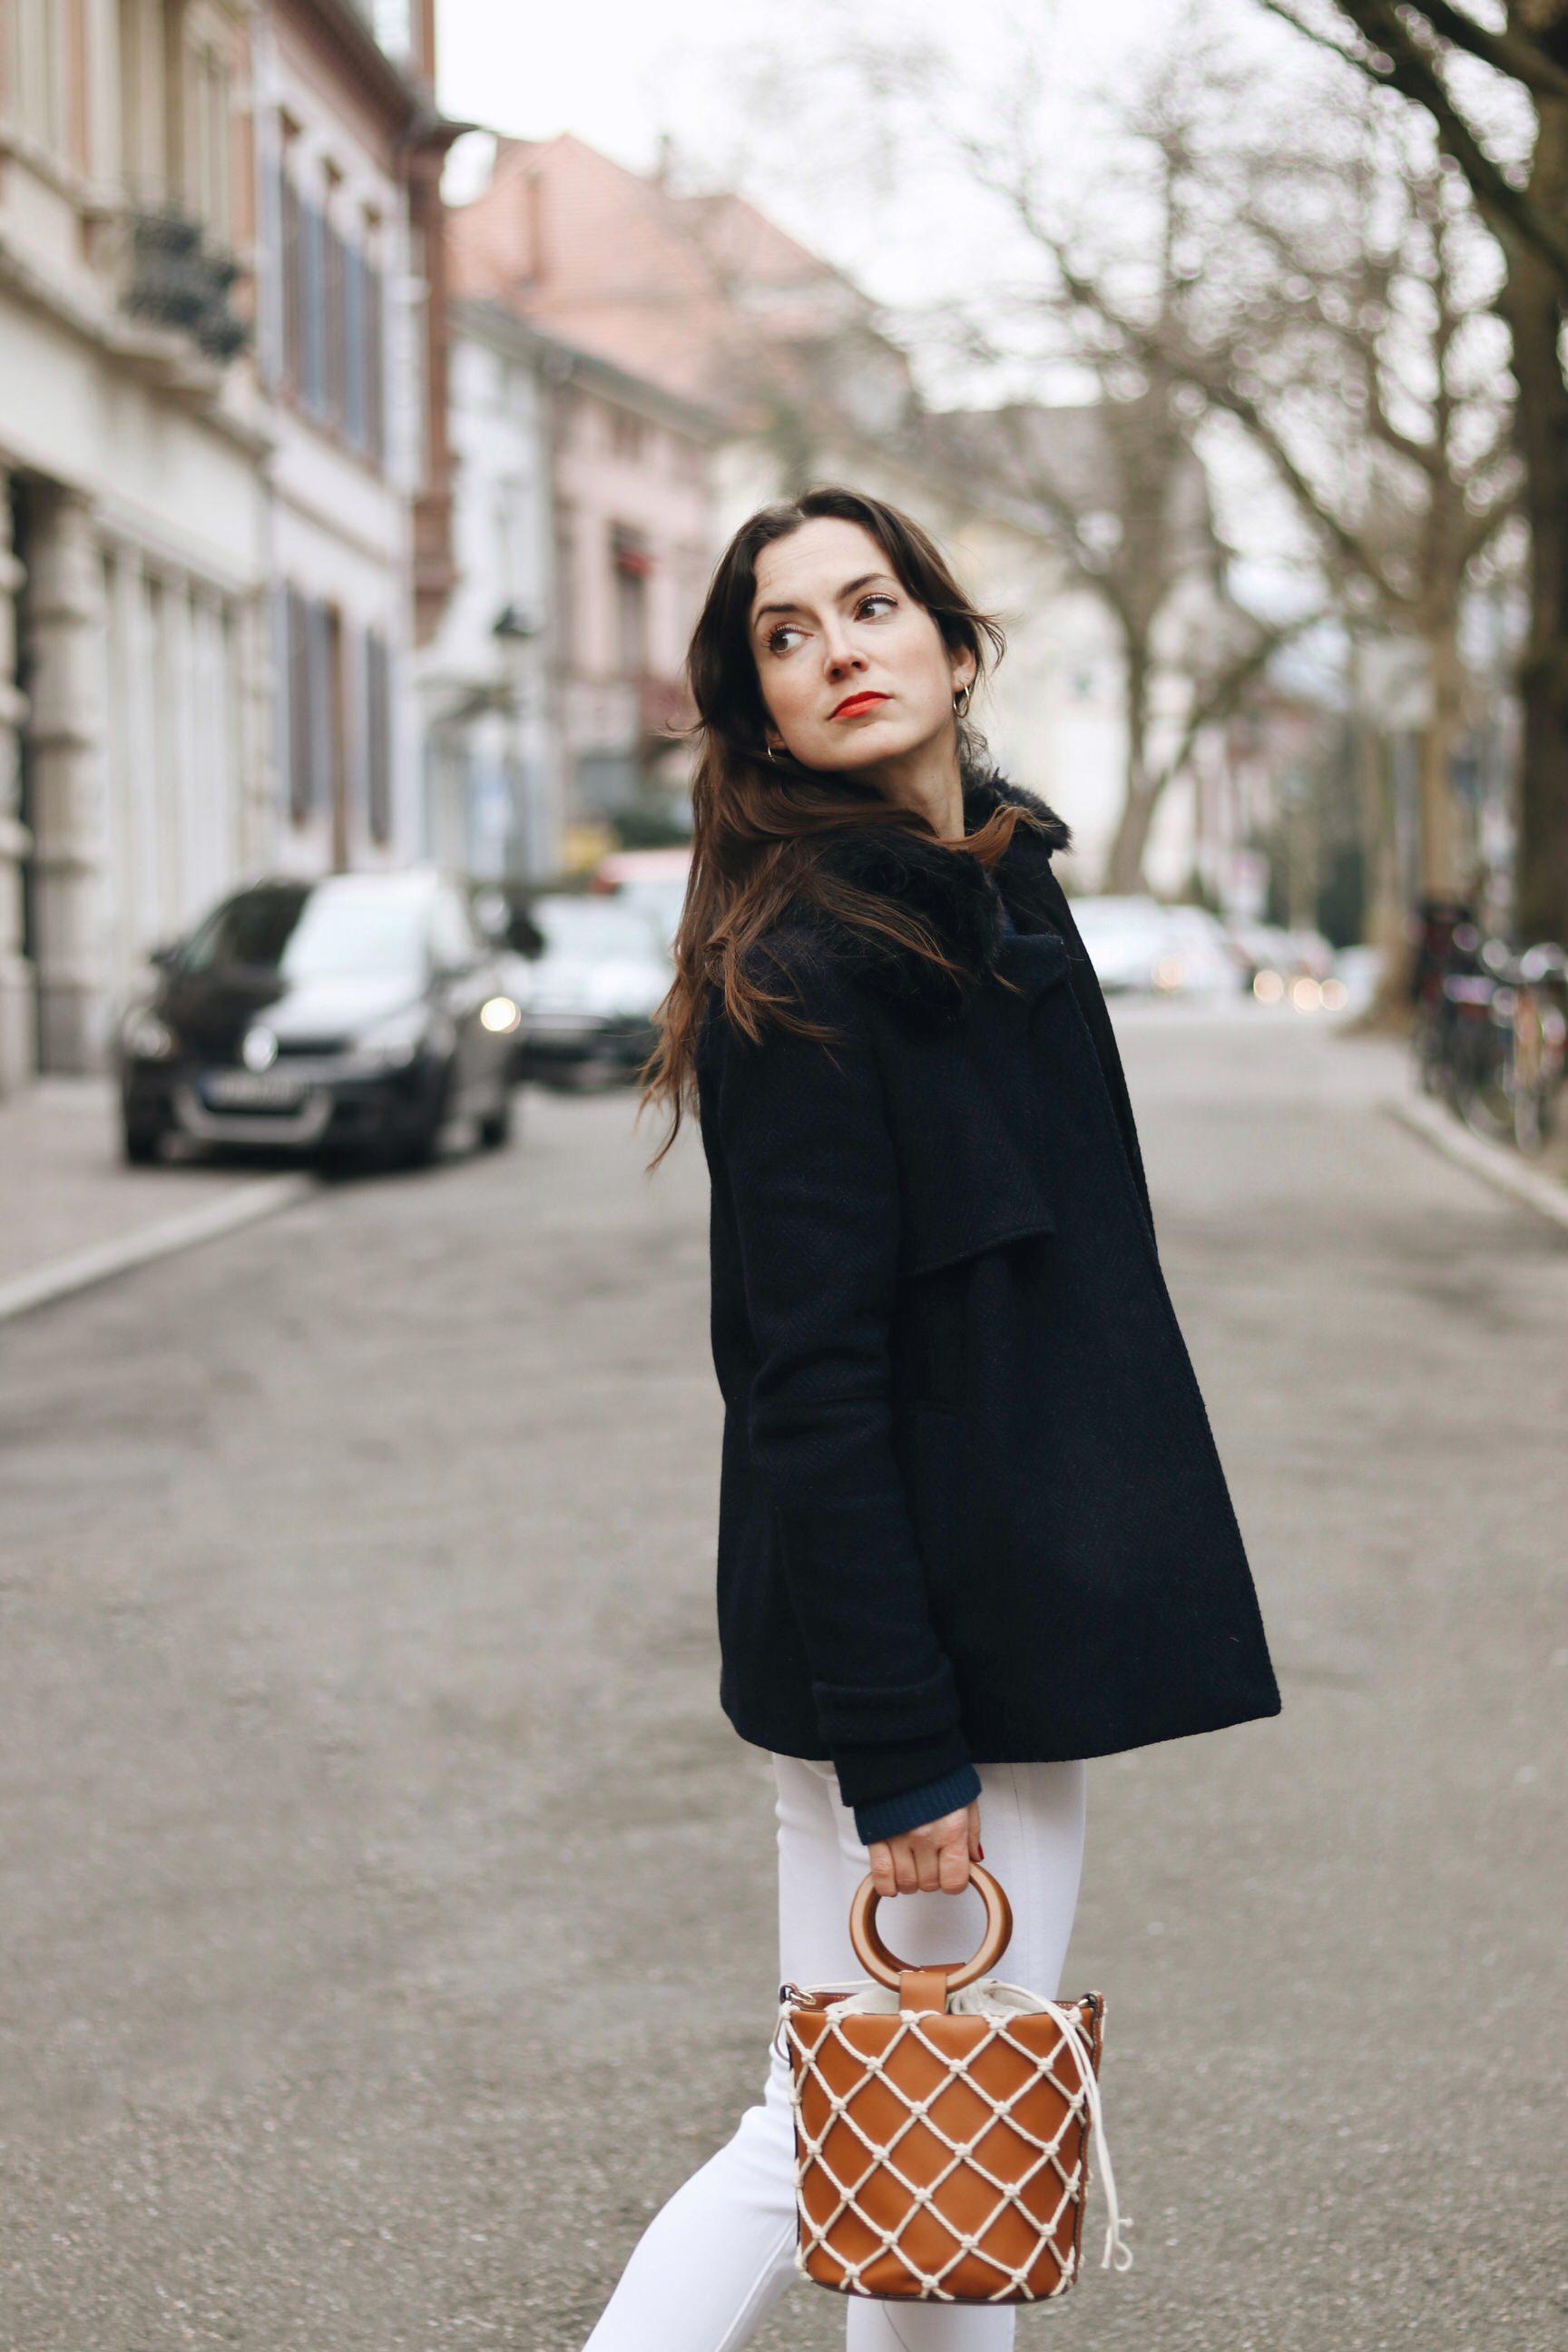 Modebloggerin Freiburg Neele Caban Jacke Winteroutfit Ideen Looks Mom Jeans Ringtasche Modetrends